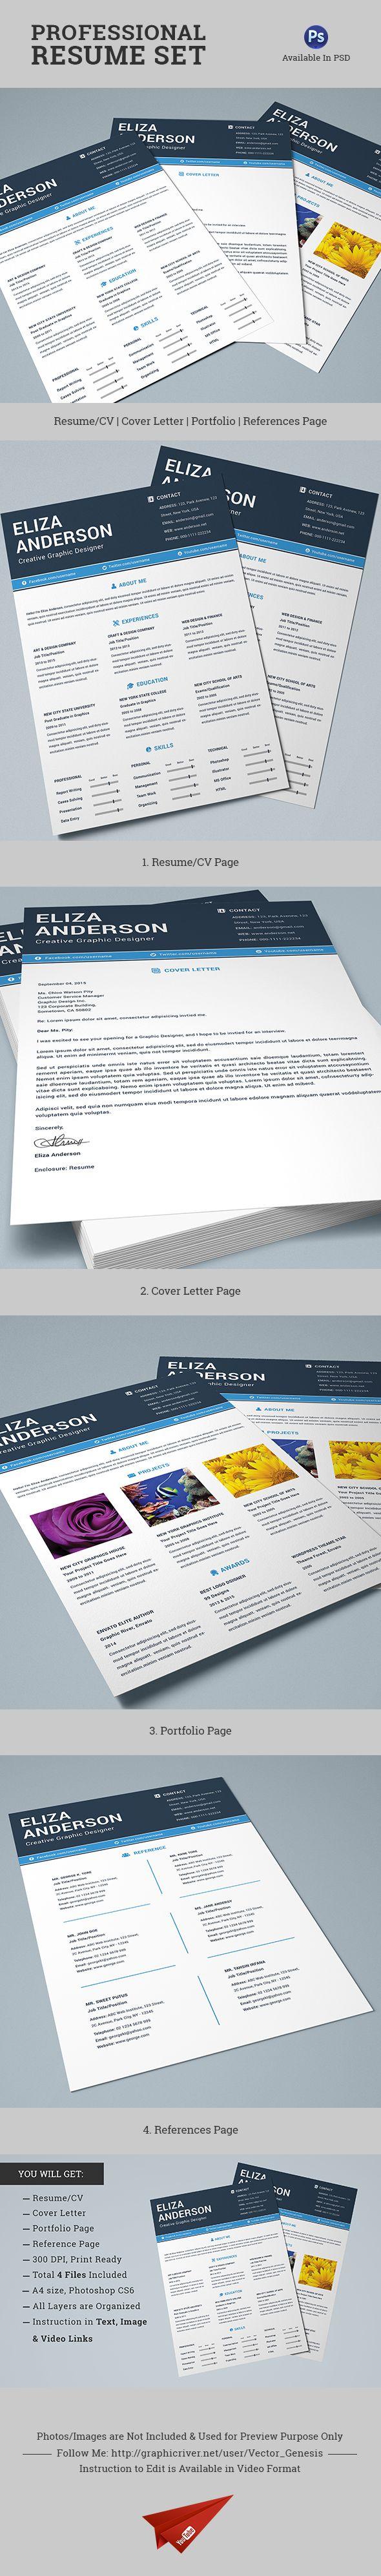 Explore the Professional Resume Set DOWNLOAD httpgoogljyqp99